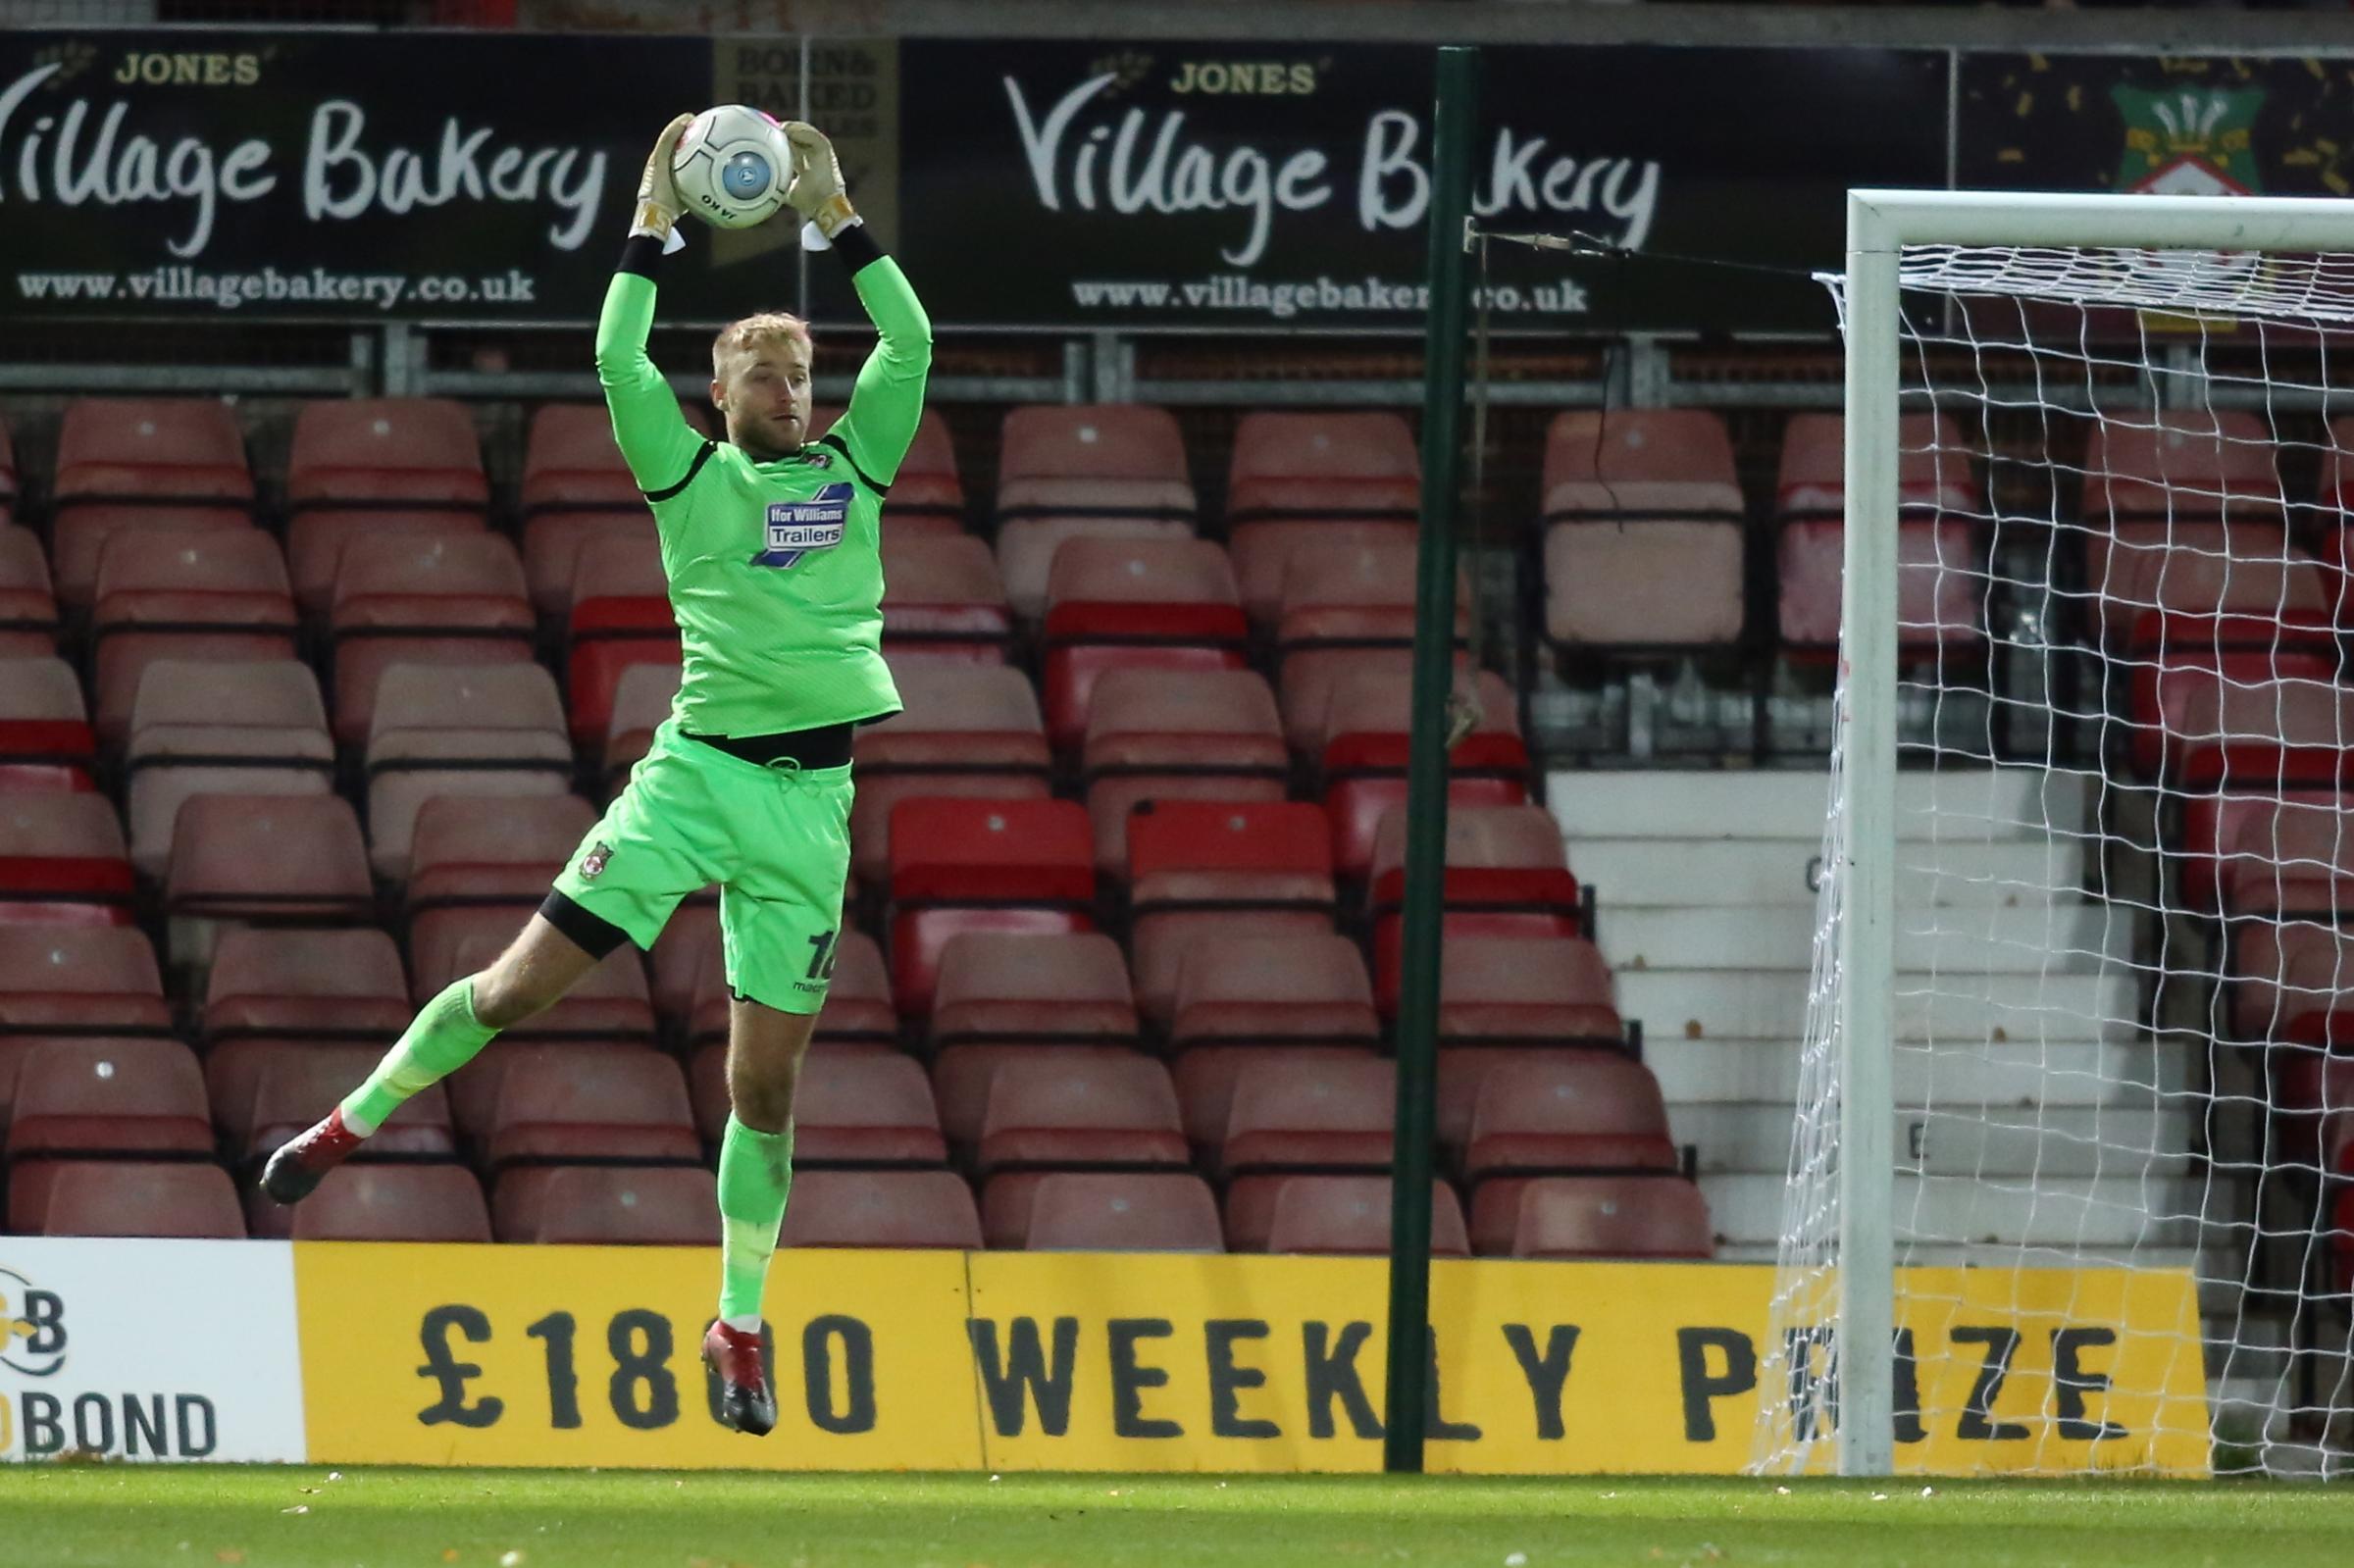 Wrexham AFC goalkeeper Rob Lainton making good progress but Manny Smith remains sidelined